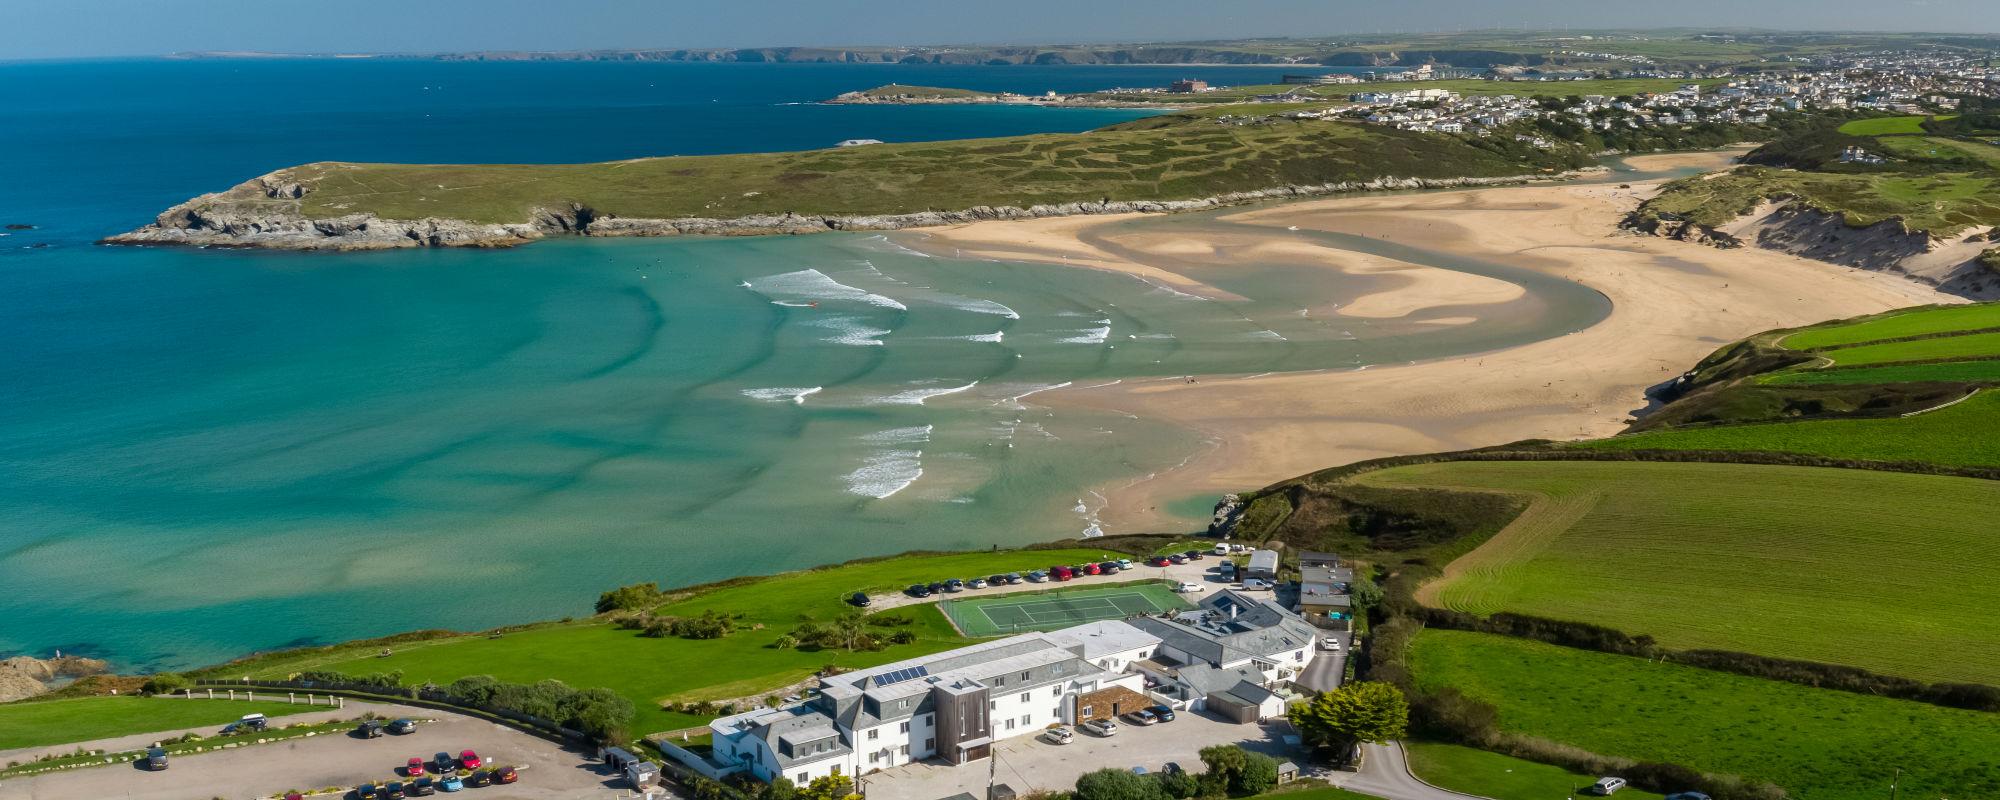 Crantock Bay Apartments homepage - Welcome to Crantock Bay